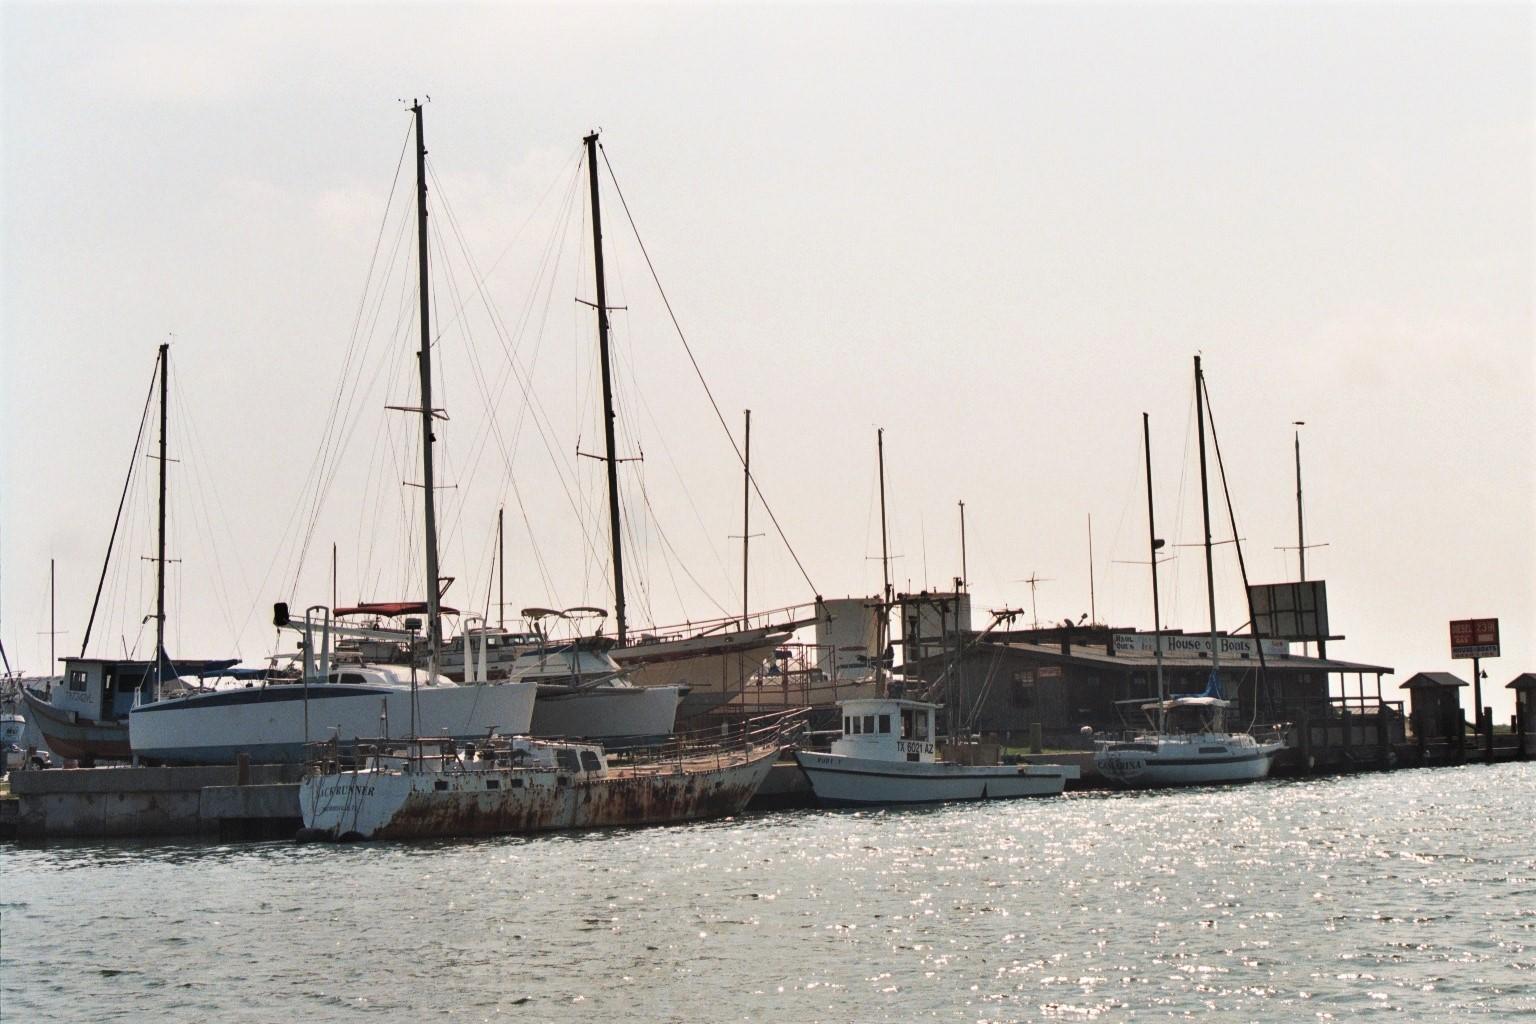 Cove Harbor